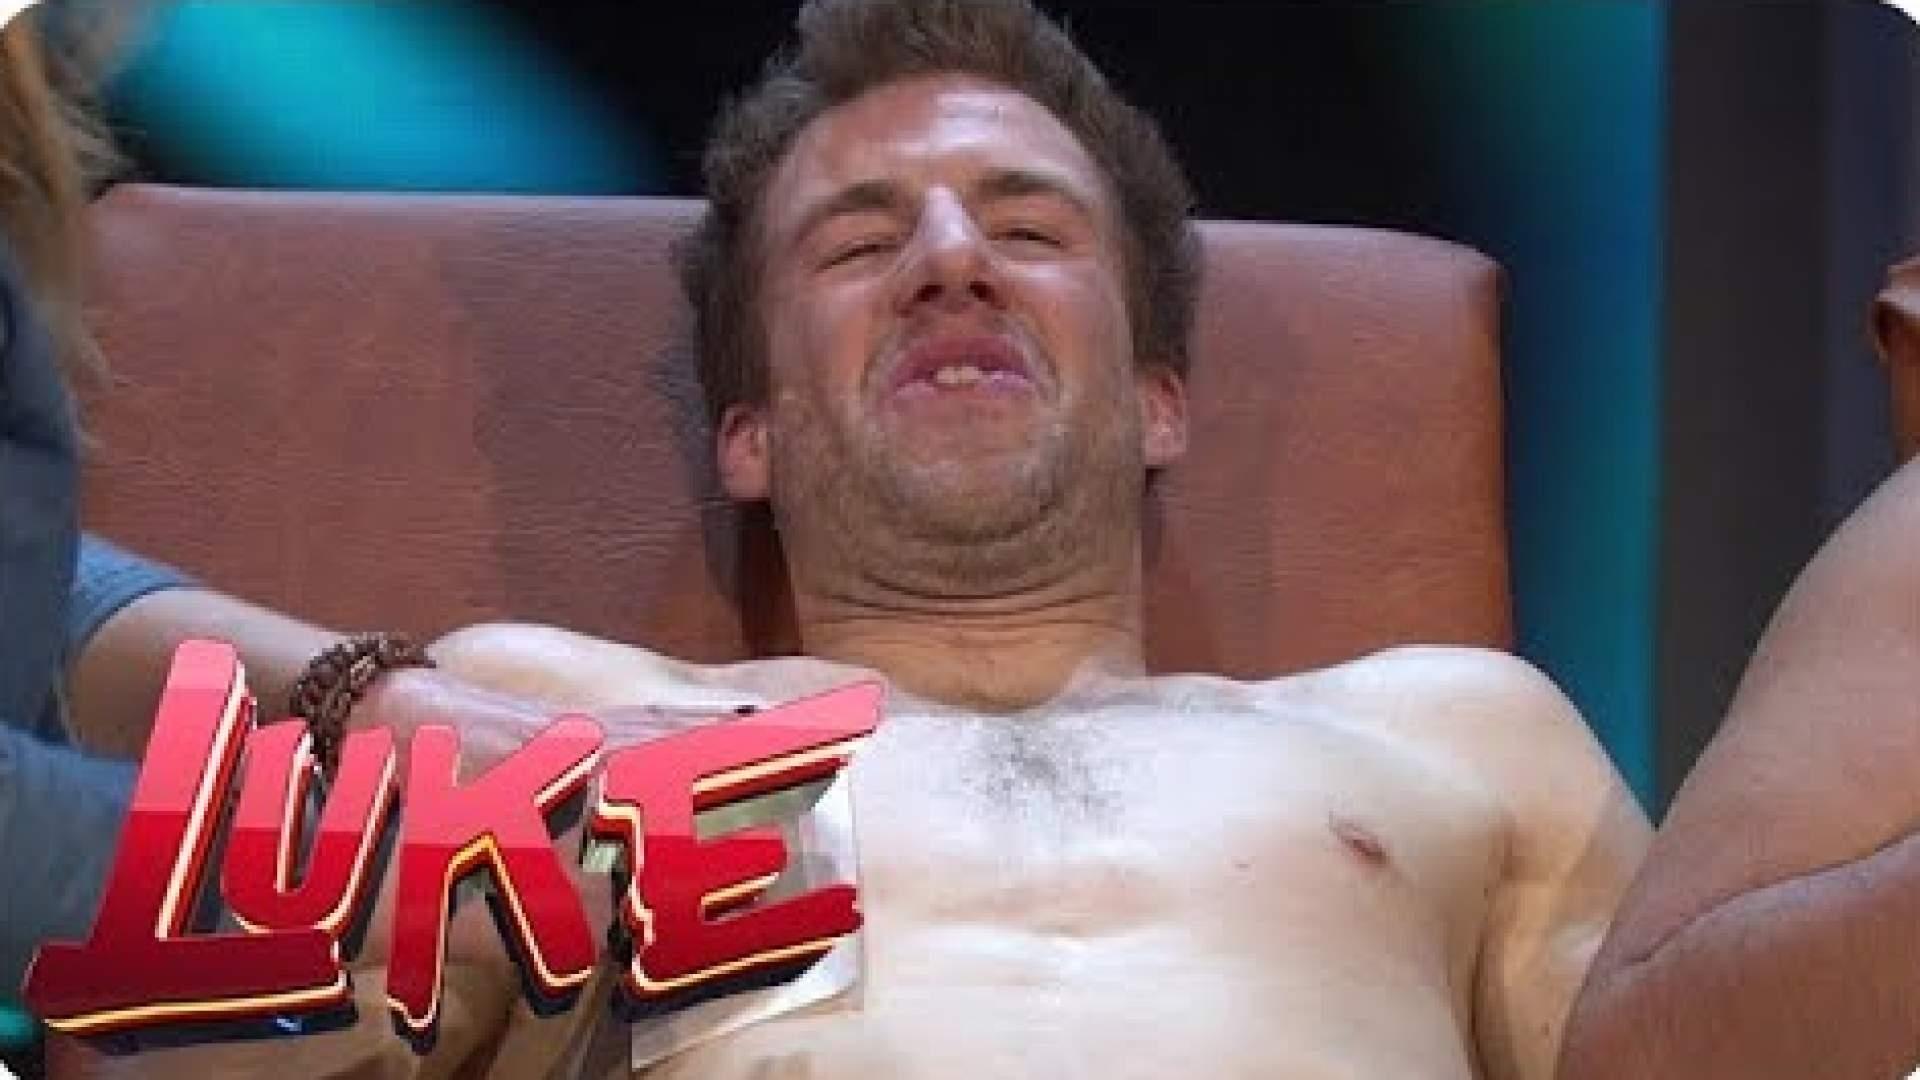 Luke und die Brustbehaarung